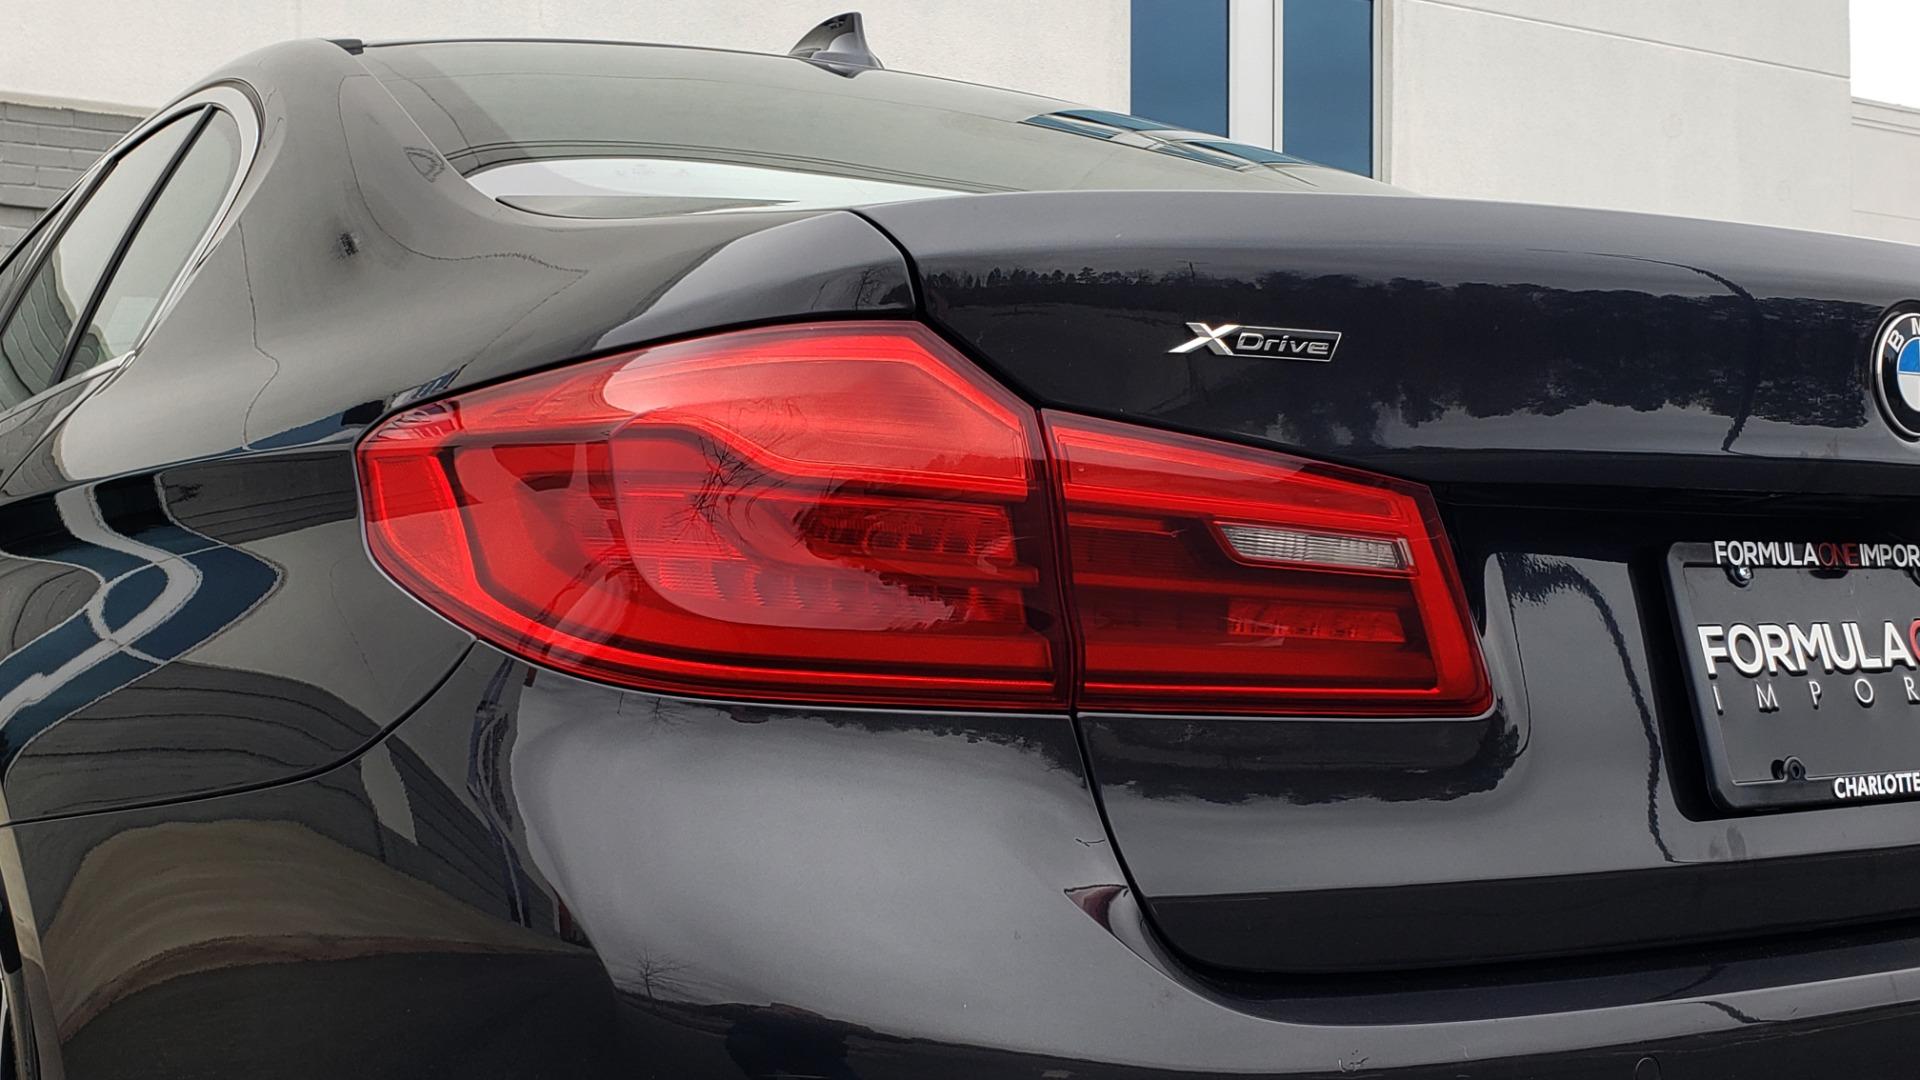 Used 2017 BMW 5 SERIES 530IXDRIVE / PREM PKG / DRVR ASST PLUS / CLD WTHR / APPLE CARPLAY for sale Sold at Formula Imports in Charlotte NC 28227 26